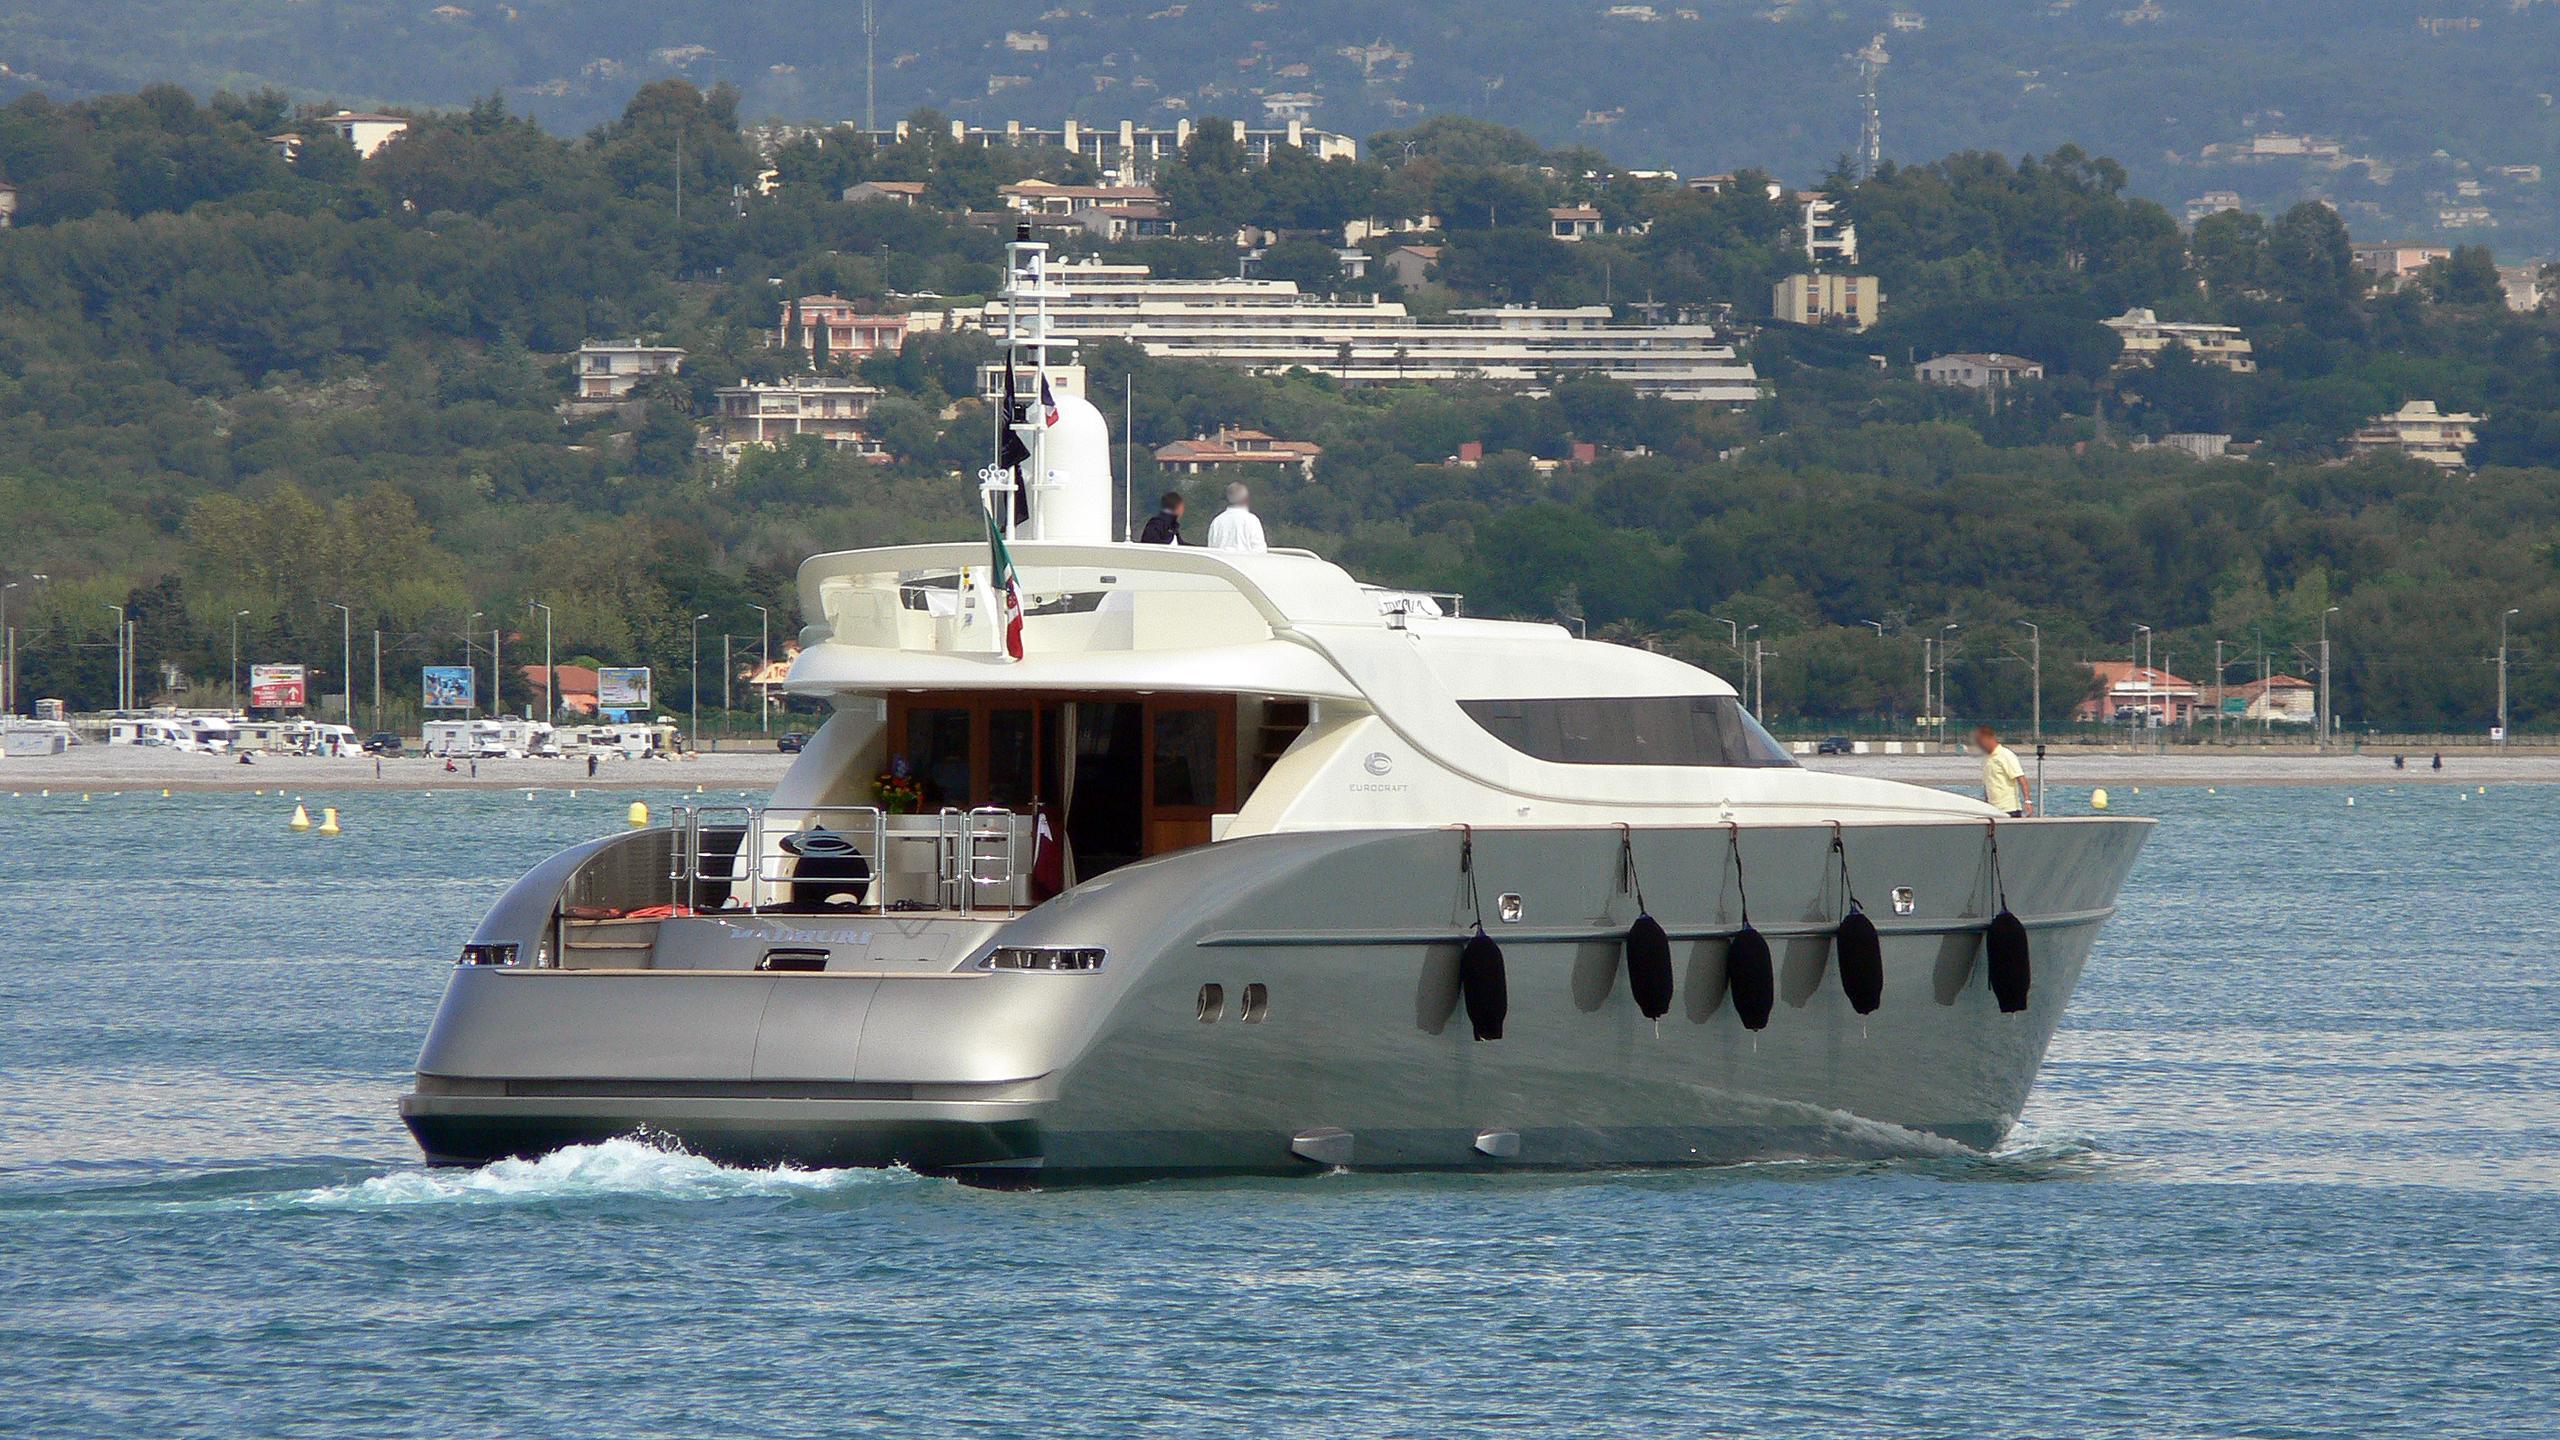 a2-madhuri-motor-yacht-eurocraft-36m-open-2008-38m-stern